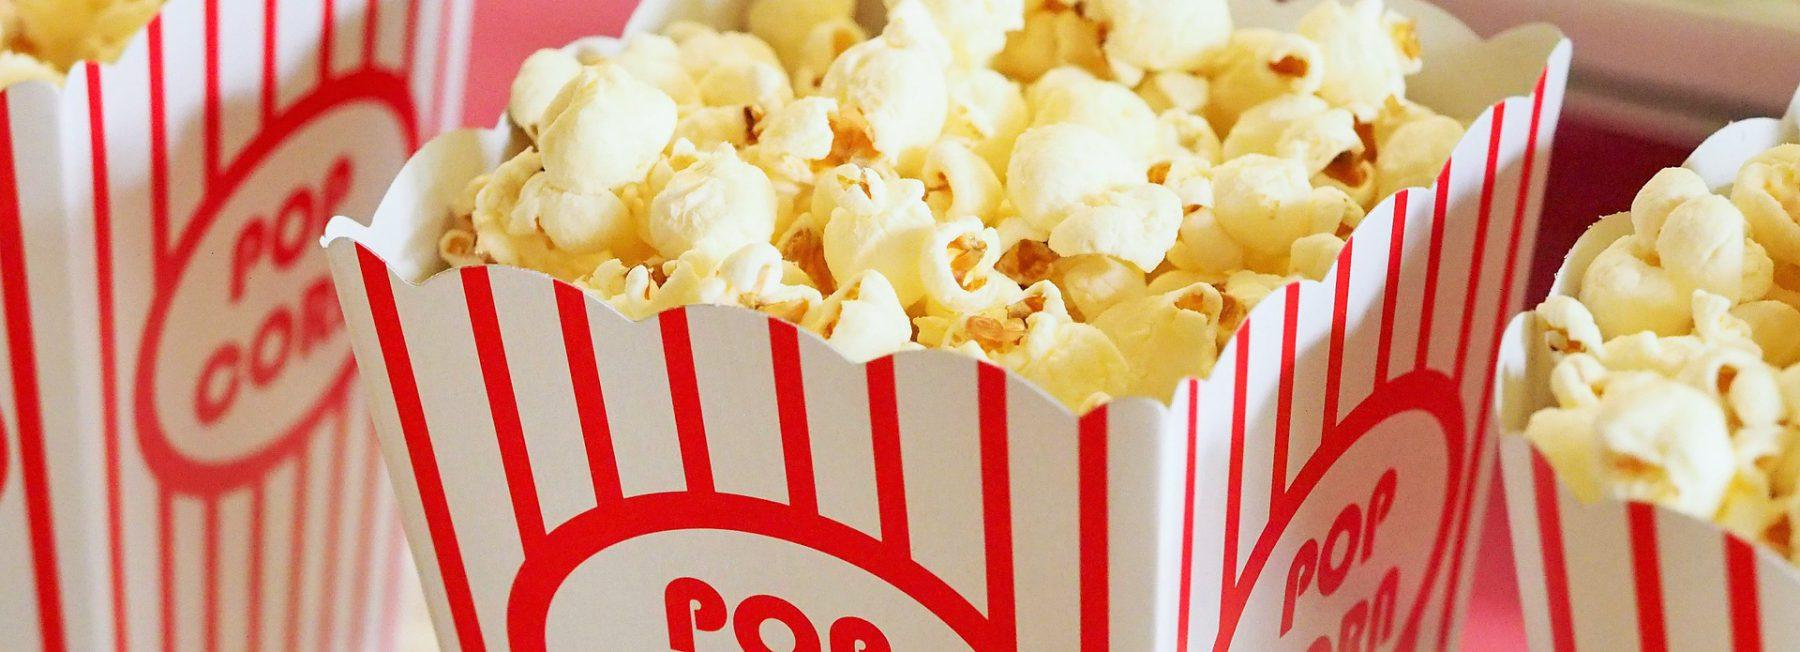 Summer Movies at the Park